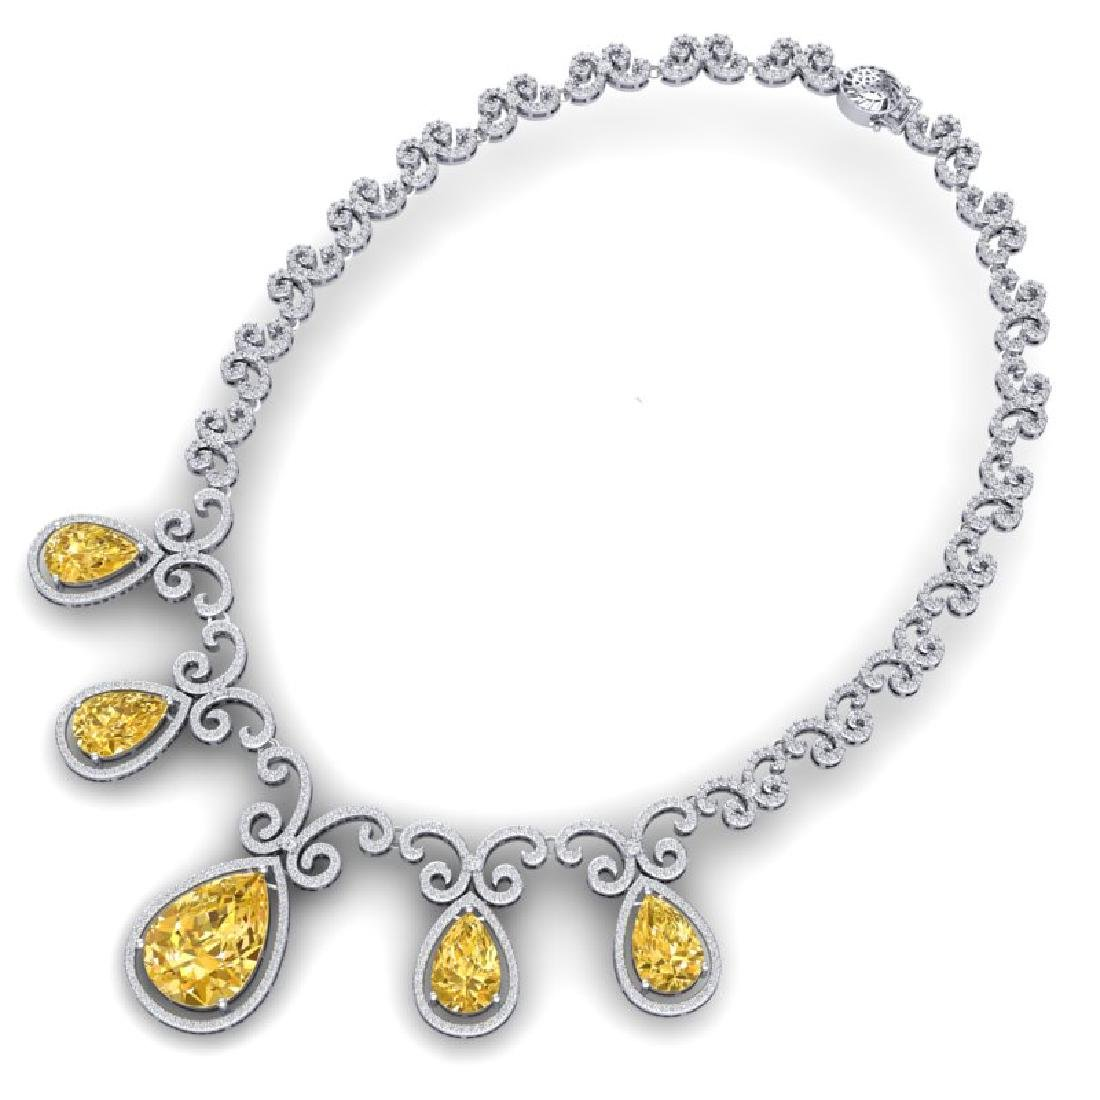 36.1 CTW Royalty Canary Citrine & VS Diamond Necklace - 3